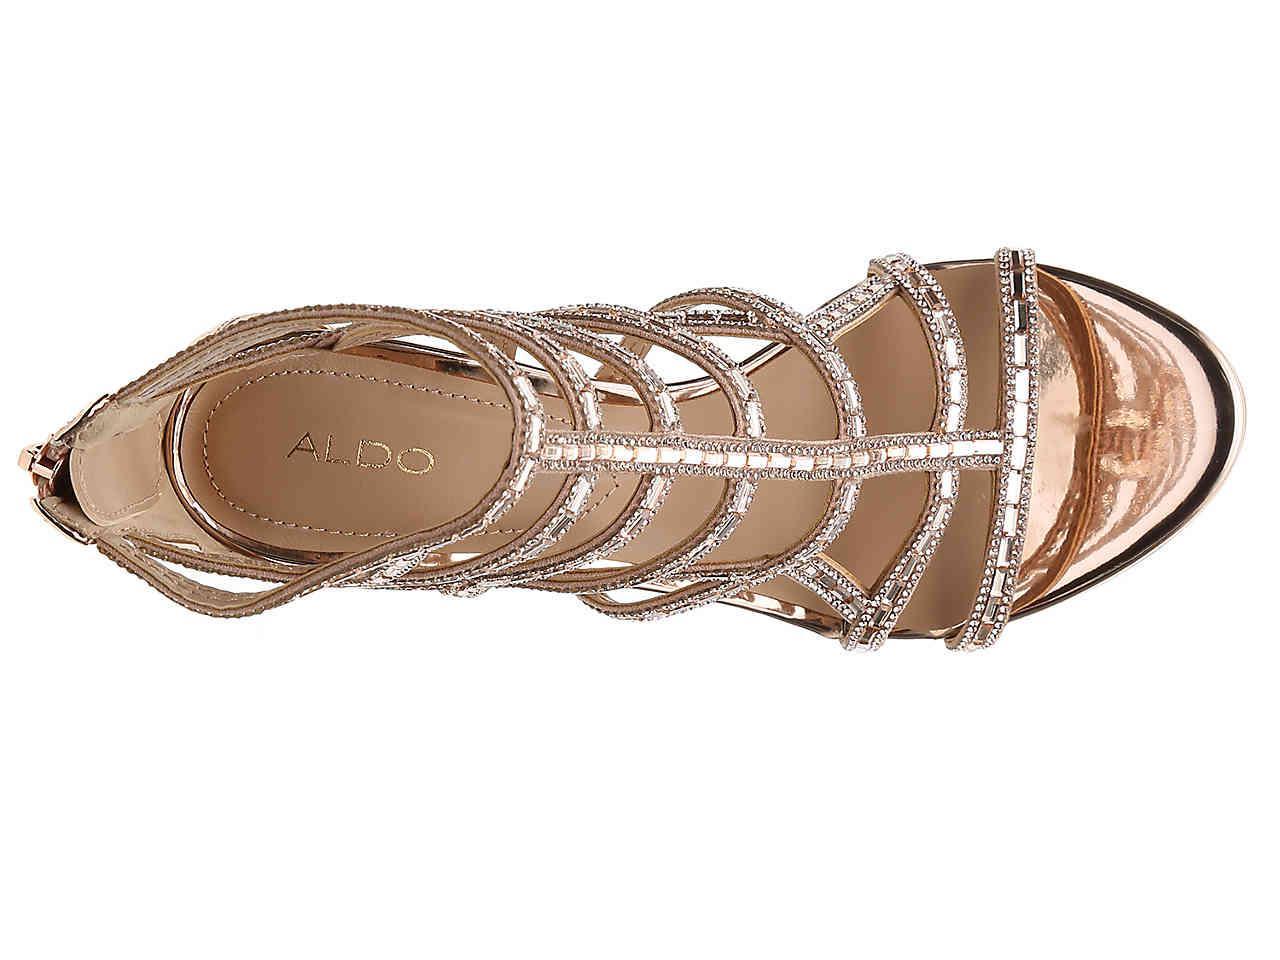 3bf1b0e8df05 Lyst - ALDO Fidenza Sandal in Metallic